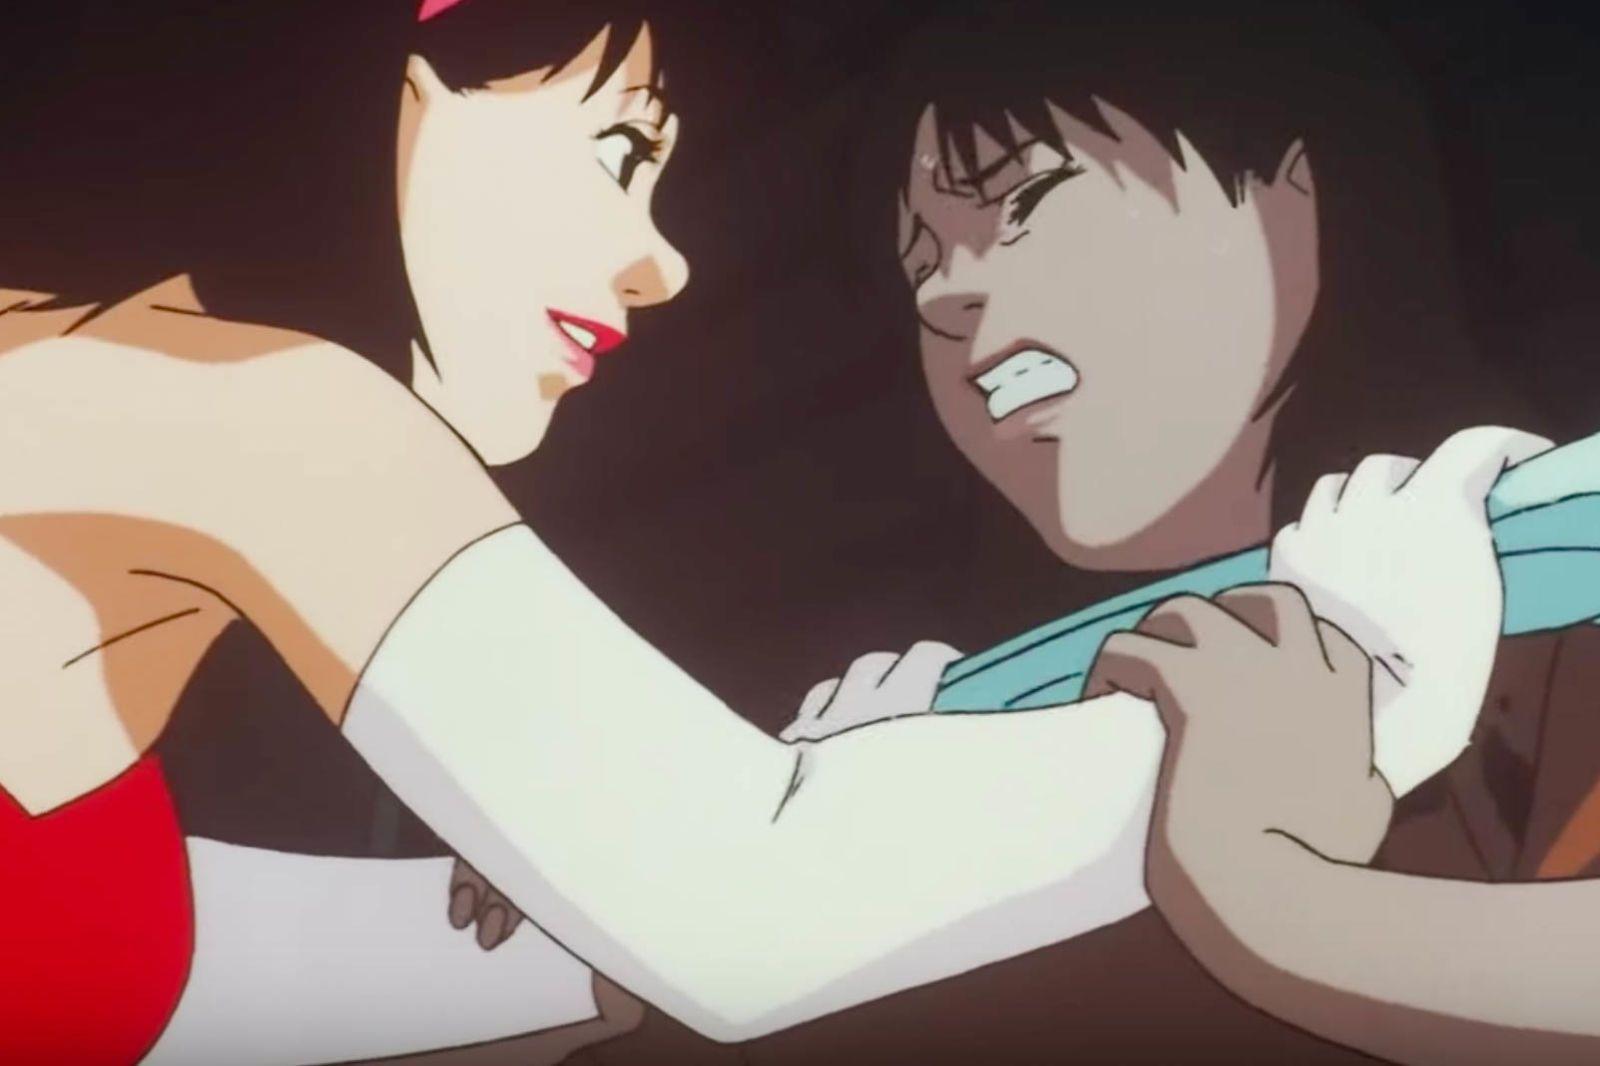 Anima tegneserie sex